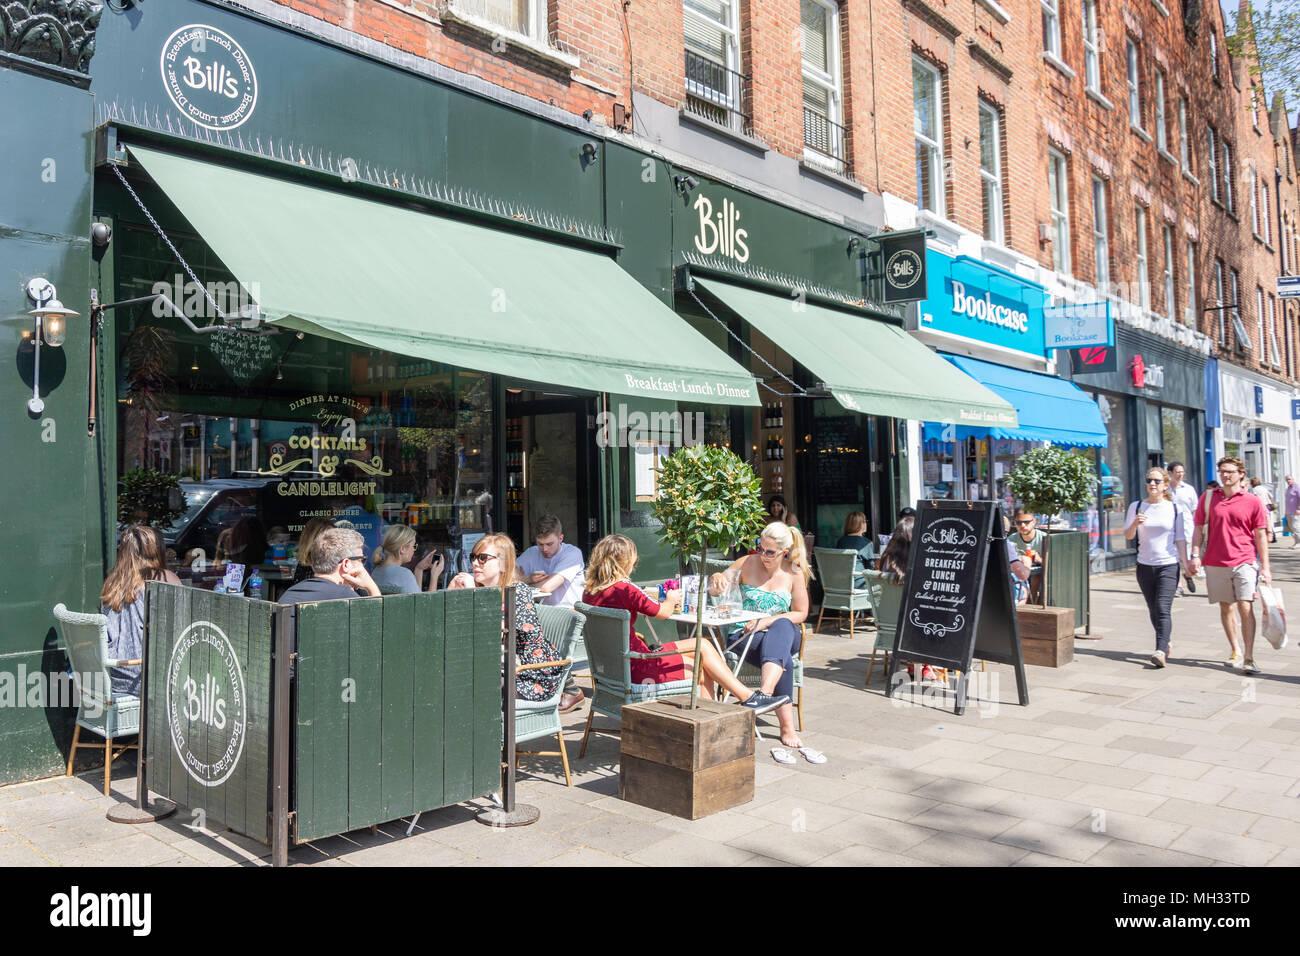 'Bill's restaurant' pavement cafe, Chiswick High Street, Chiswick, London Borough of Hounslow, Greater London, England, United Kingdom - Stock Image